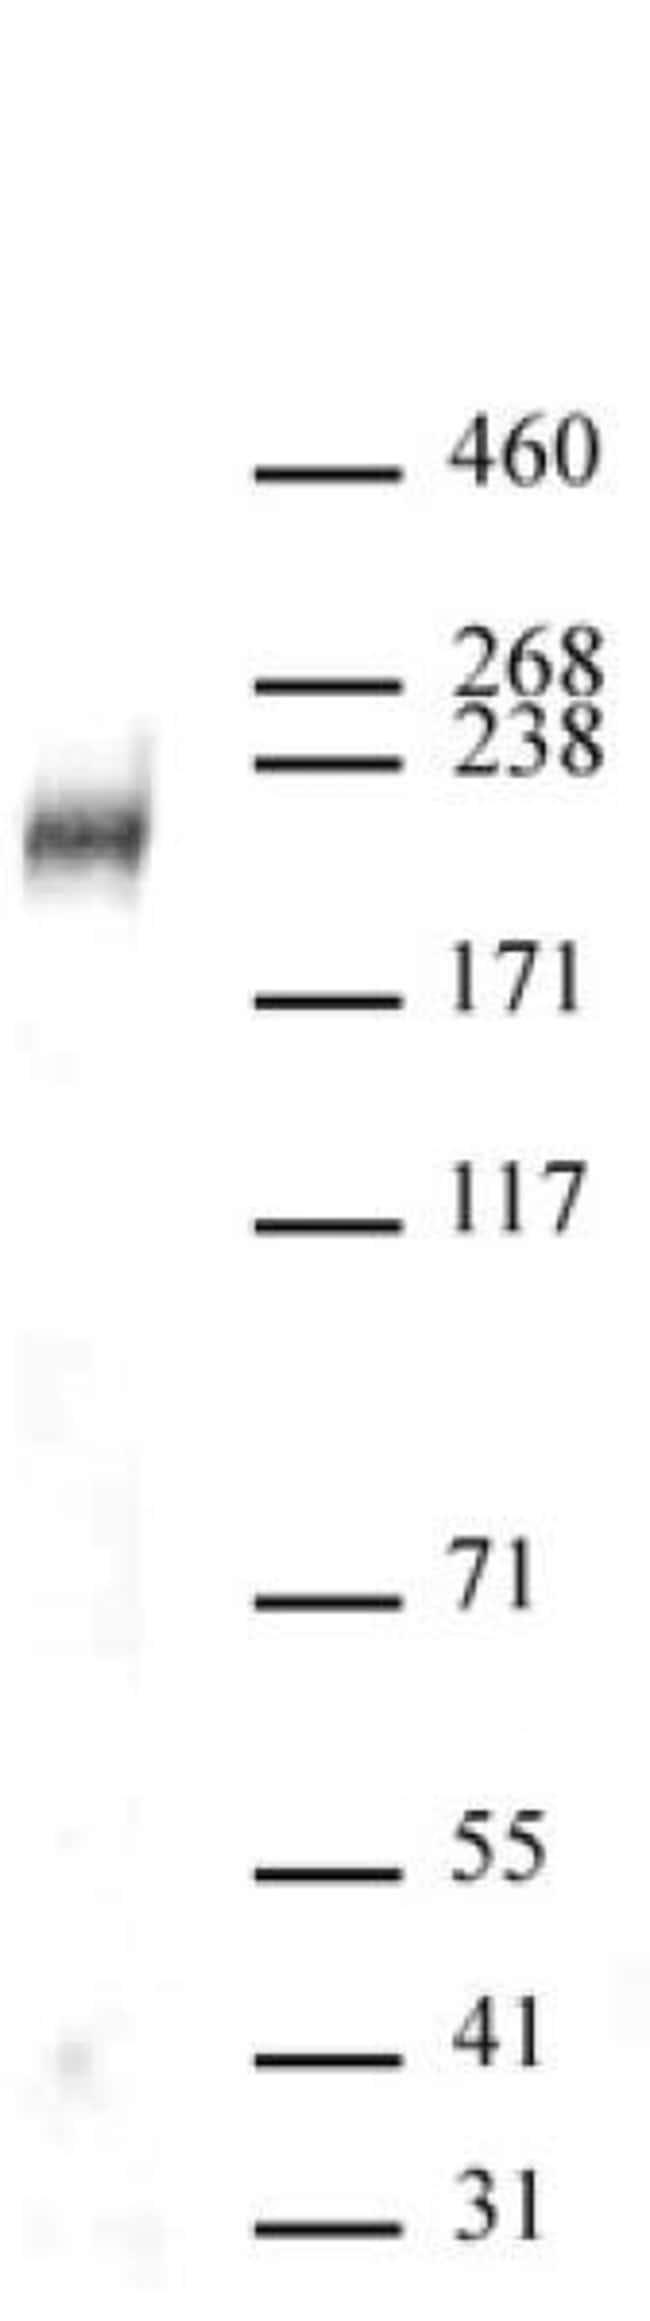 DOT1L Rabbit anti-Human, Unconjugated, Polyclonal, Active Motif:Antibodies:Primary